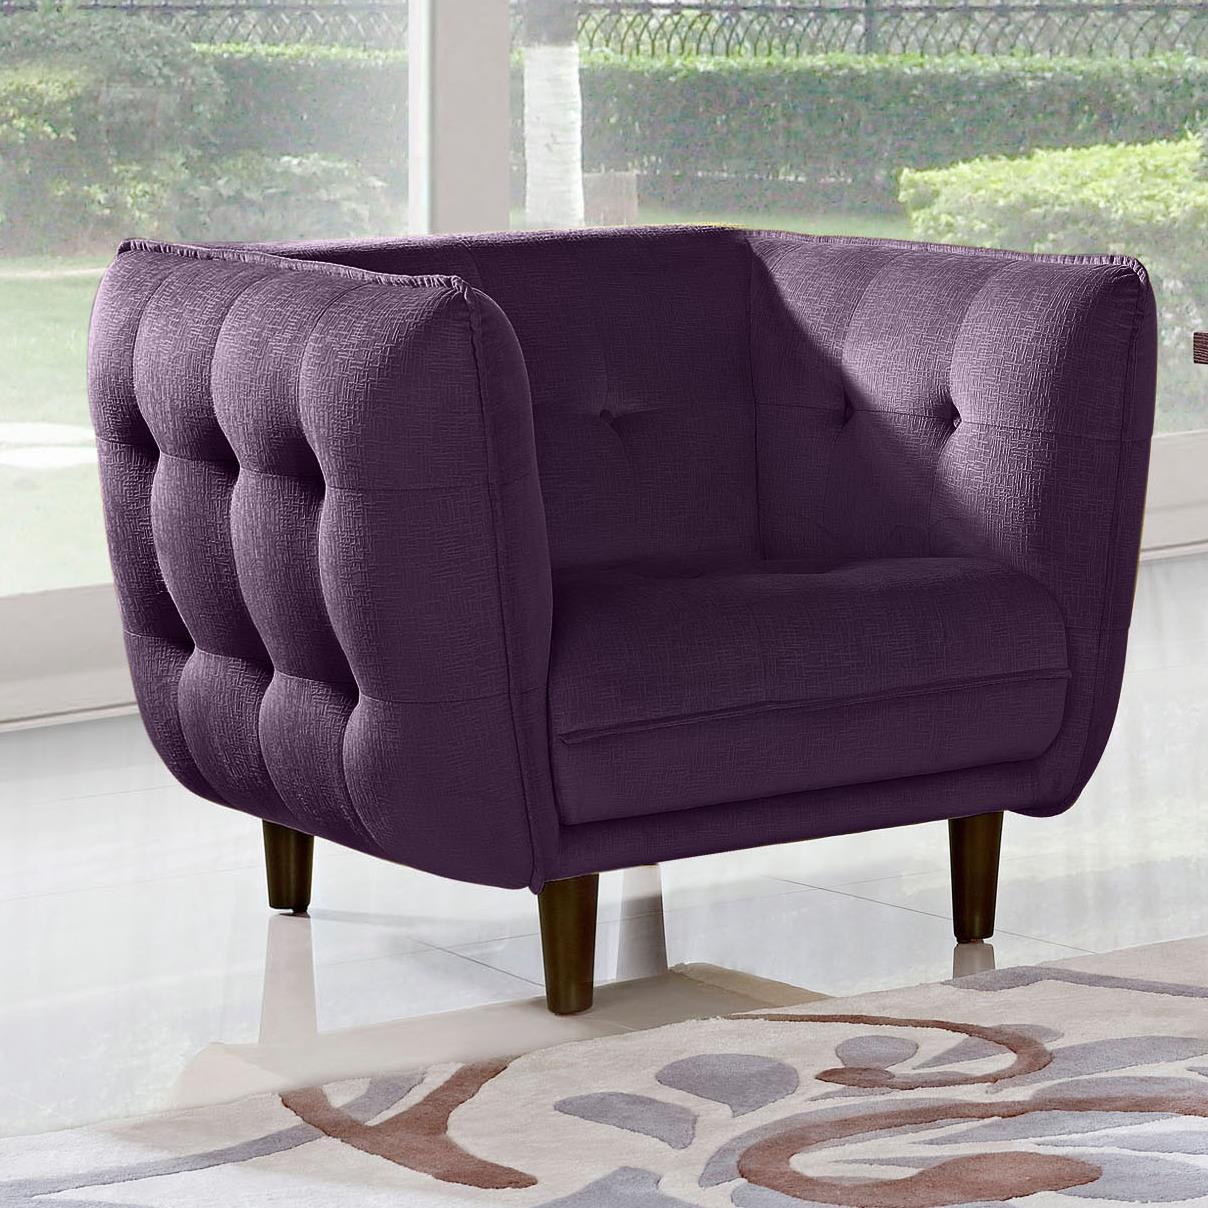 Diamond Sofa Venice Button Tuft Fabric Chair - Item Number: VENICECHPR